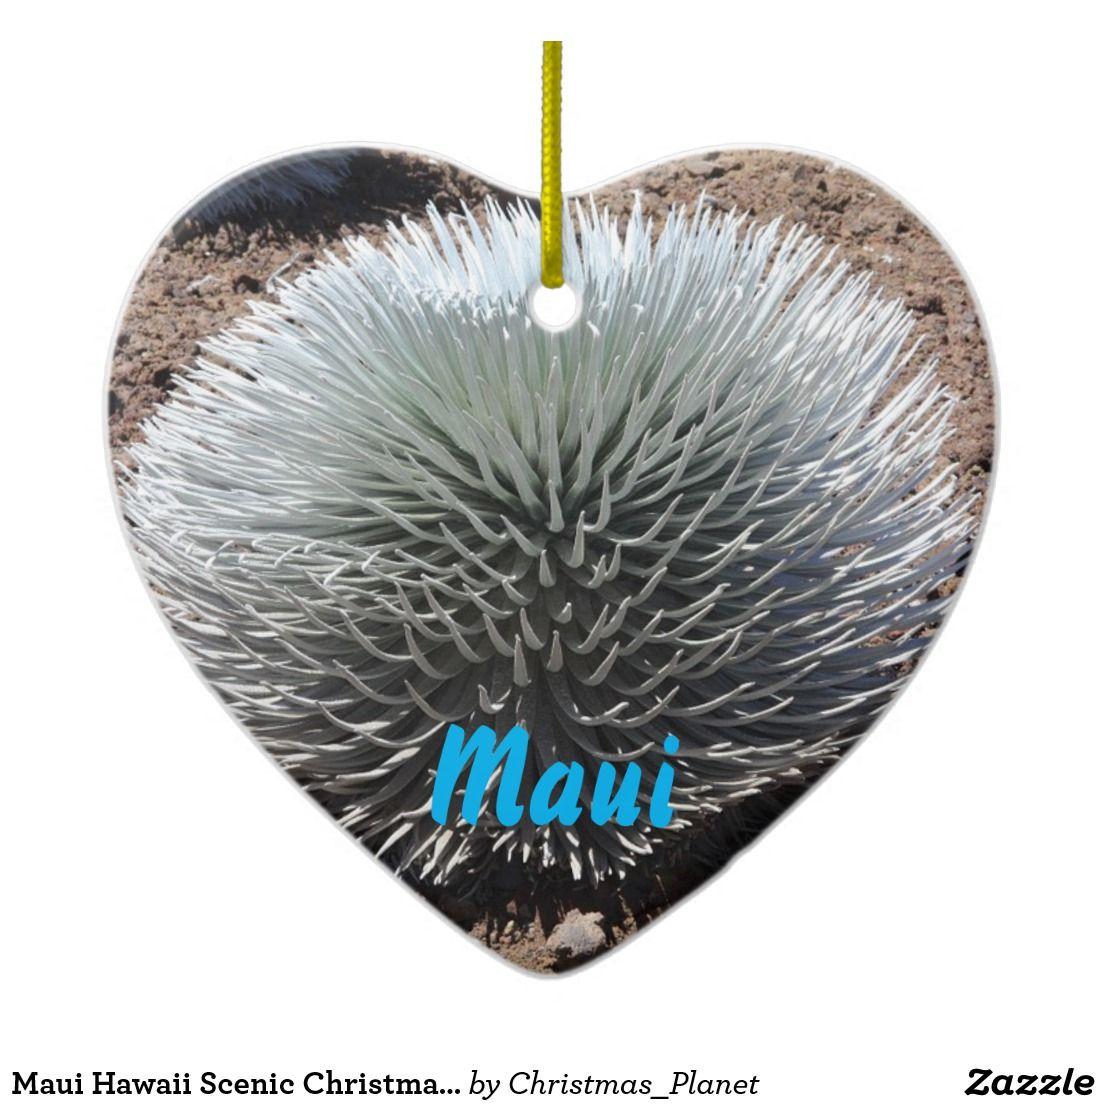 USA: Maui Hawaii Scenic Christmas Ornament | Zazzle.com ...